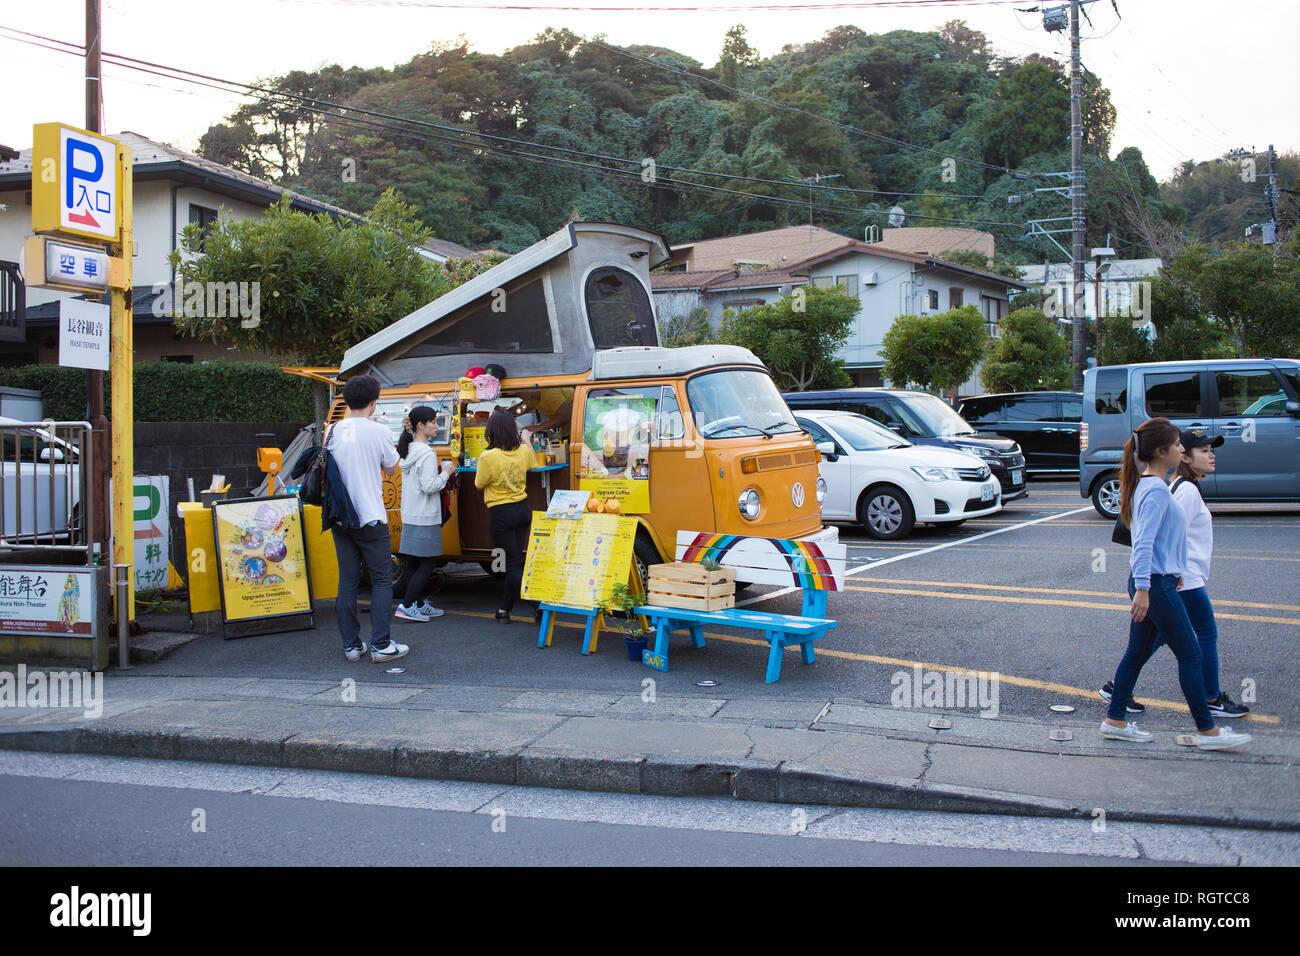 Vendors in Kamakura, Kanagawa, Japan.  Photo by Akira Suemori - Stock Image